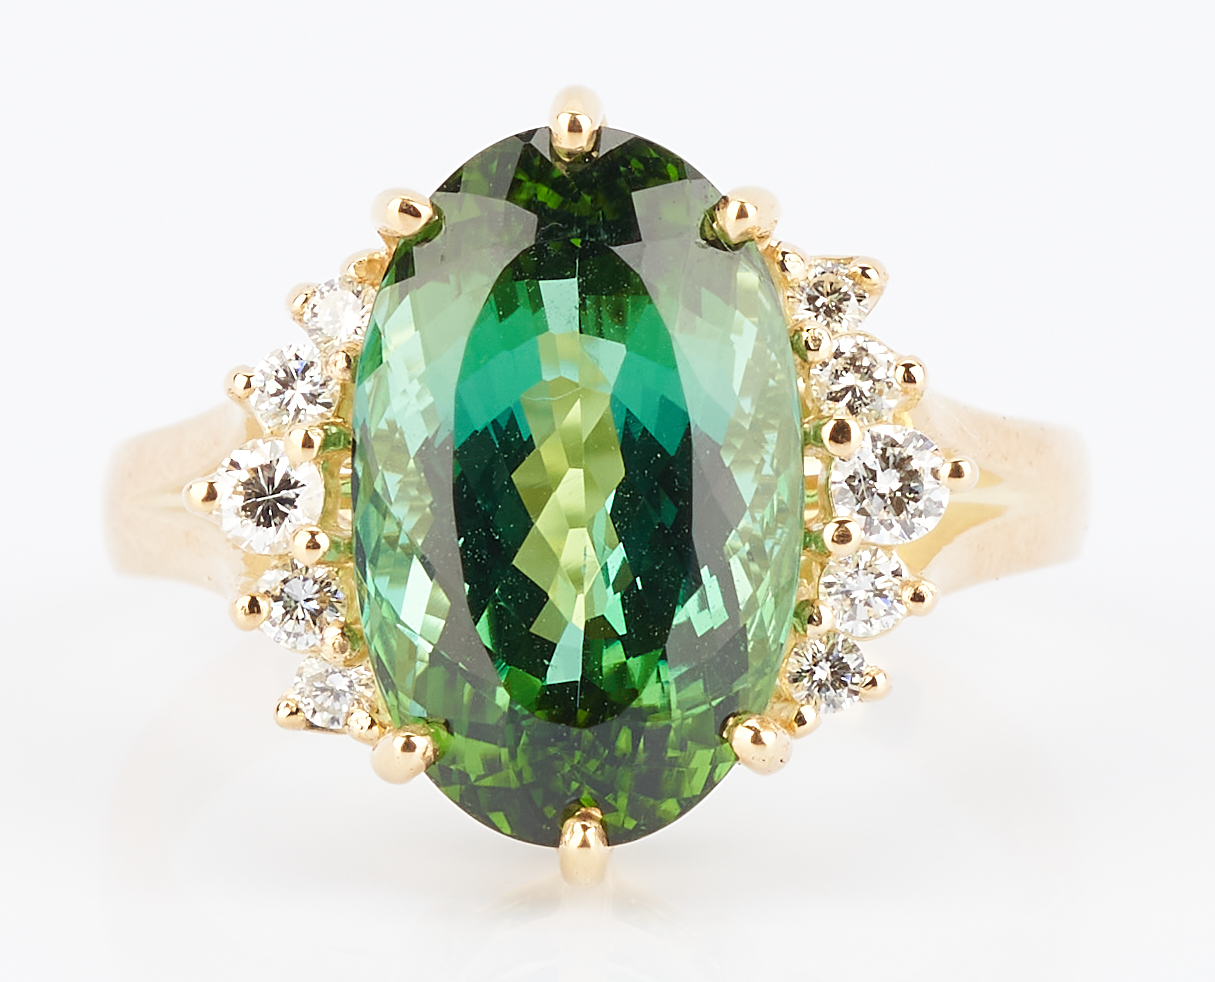 Lot 254: H. Stern 18K Green Tourmaline Ring, 5 Carats